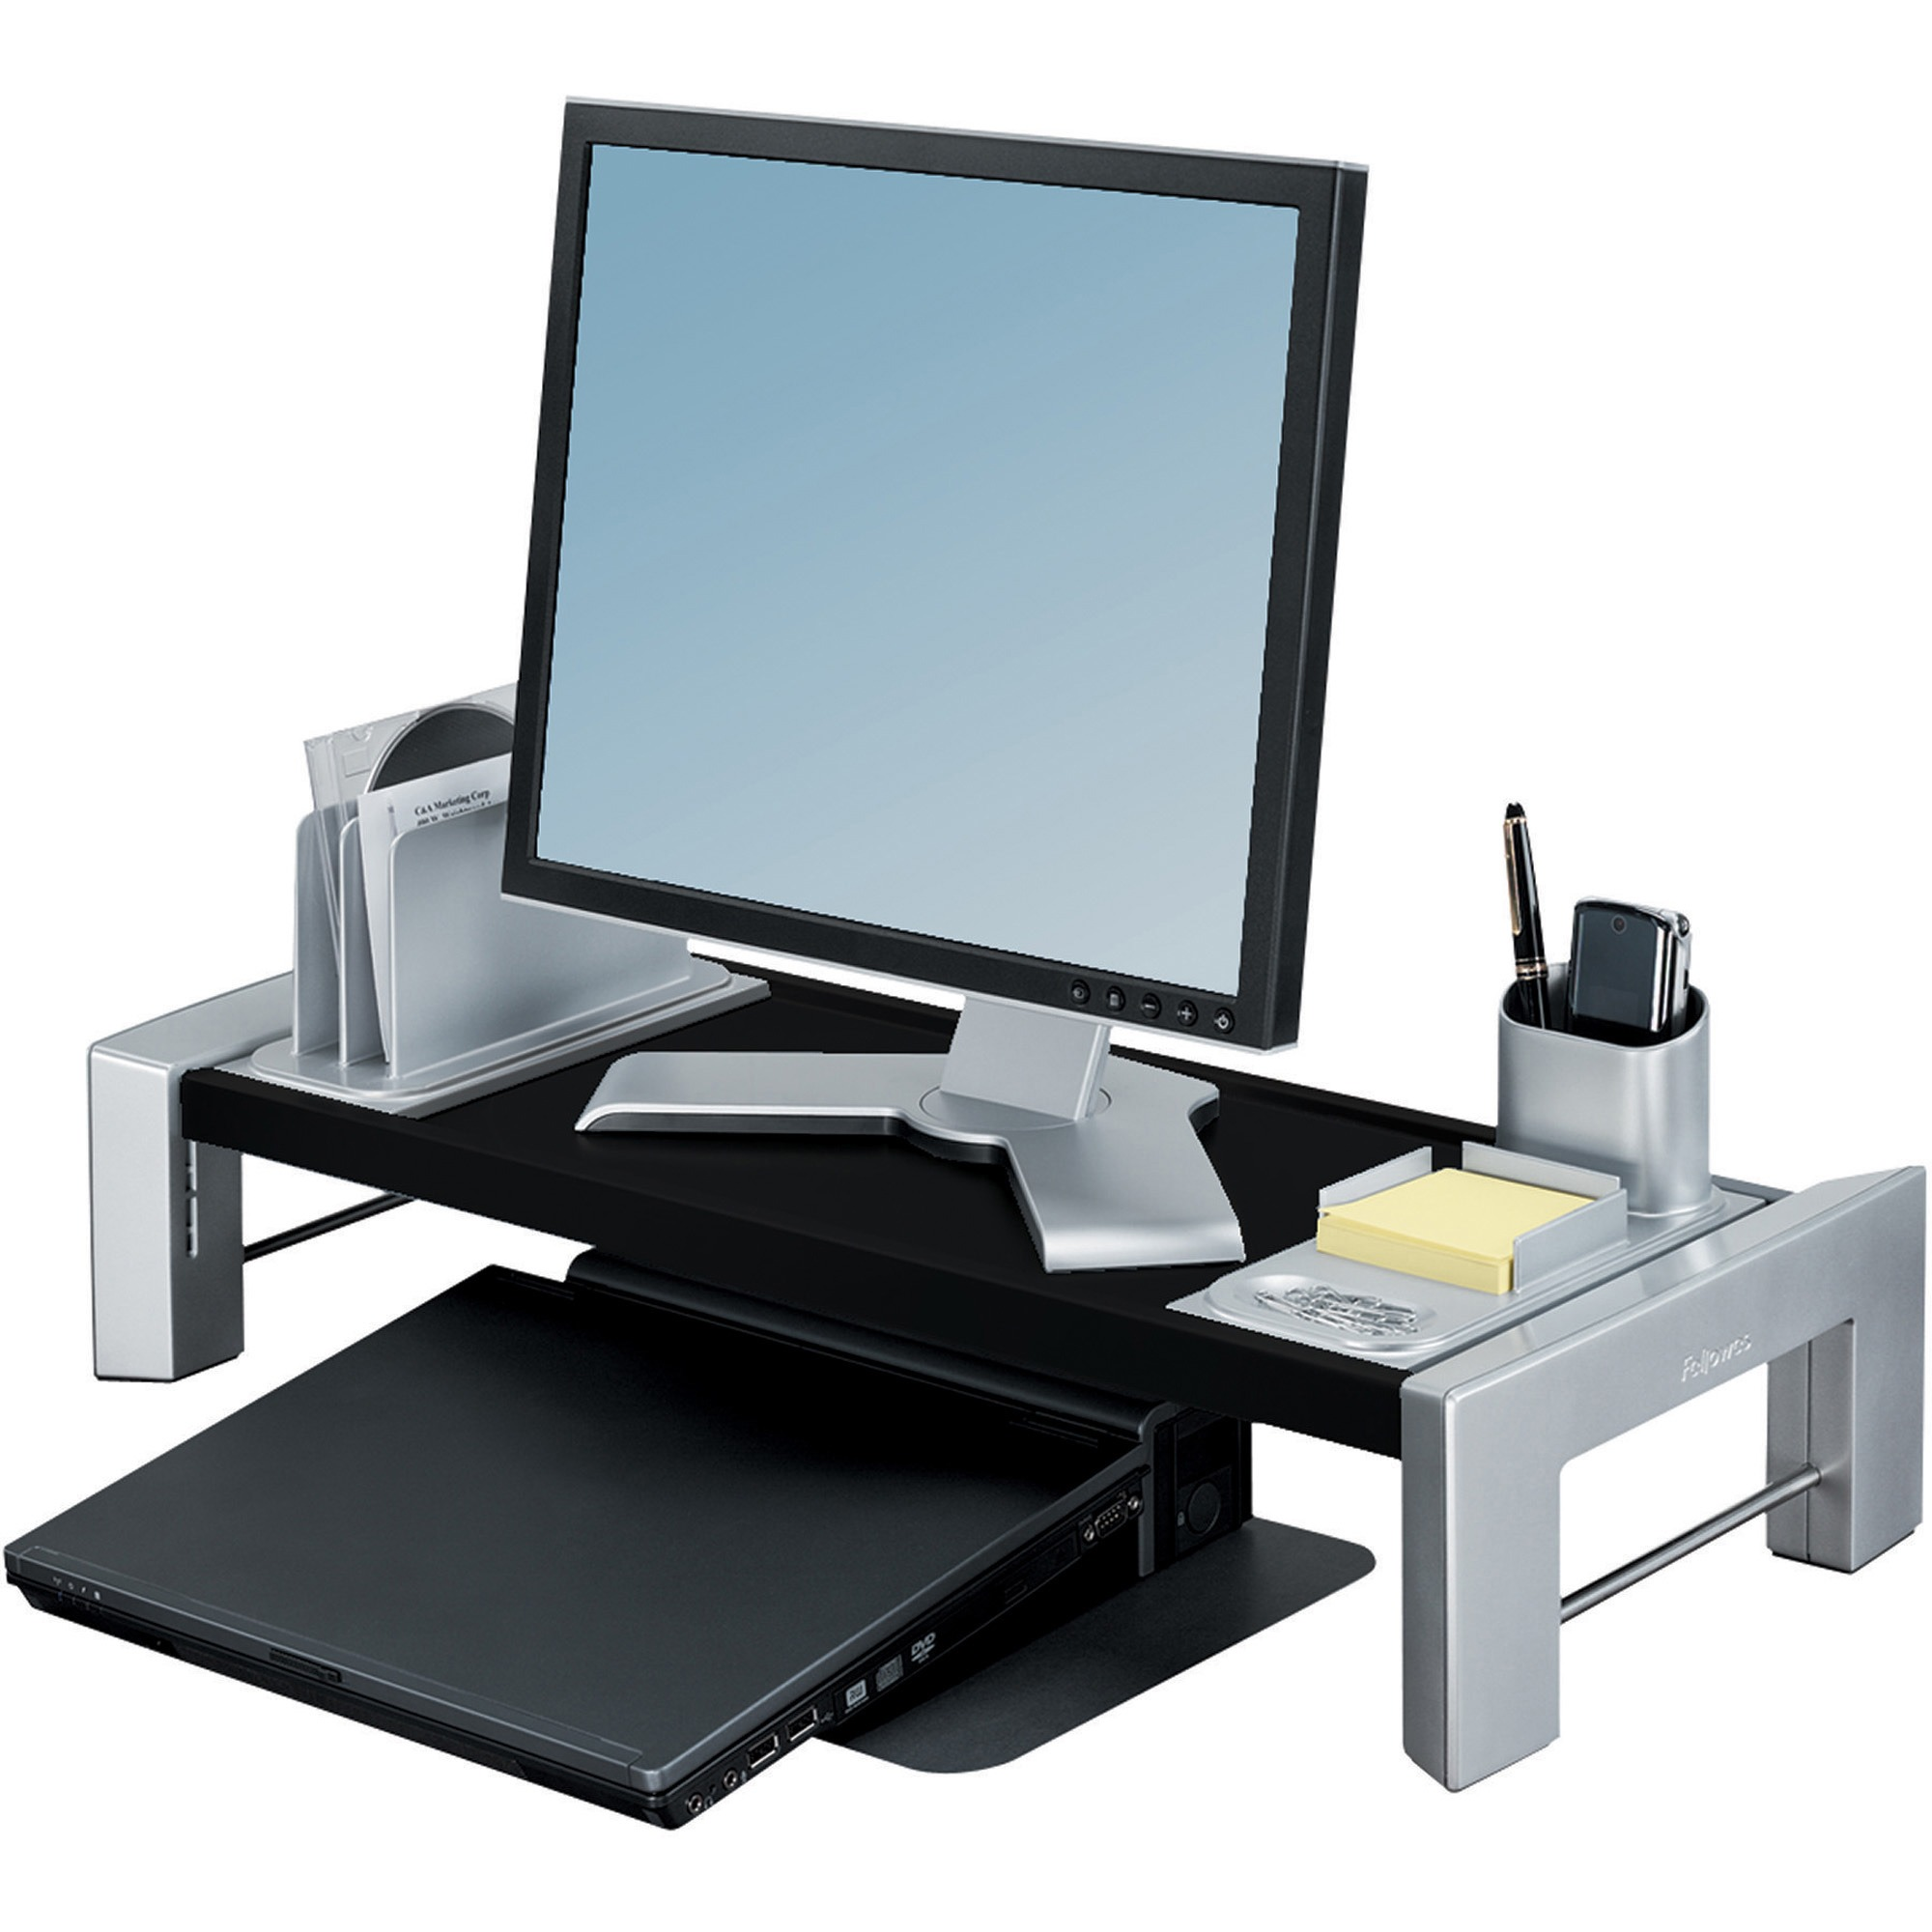 Fellowes, FEL8037401, Flat Panel Adjustable Height Workstation, 1 Each, Silver,Black